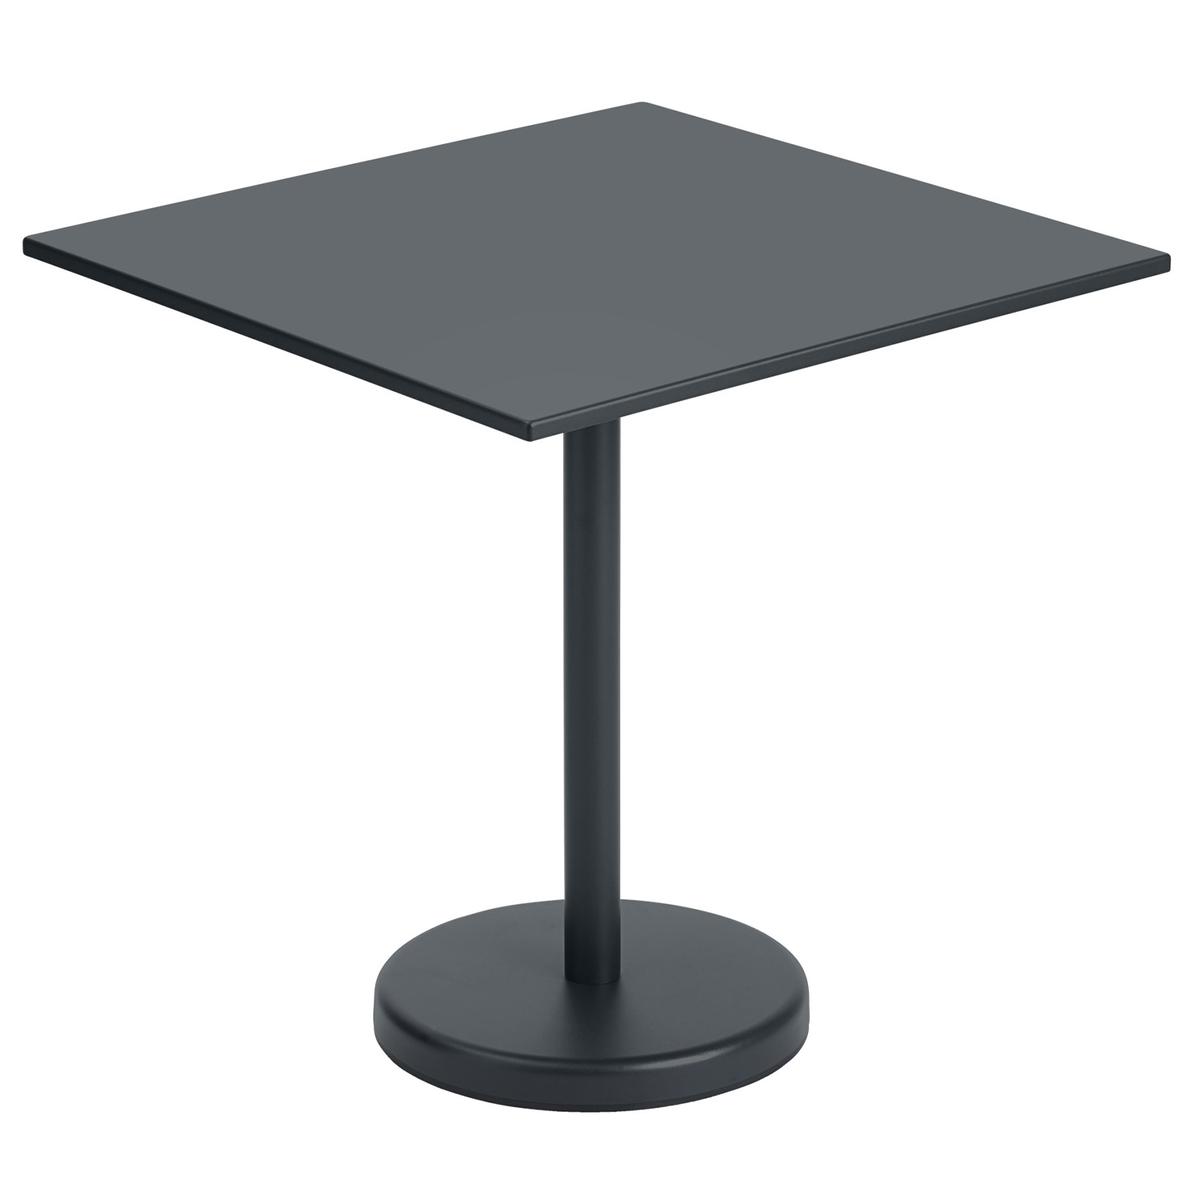 Muuto Linear Steel Café Table 70 X 70 Cm, Black